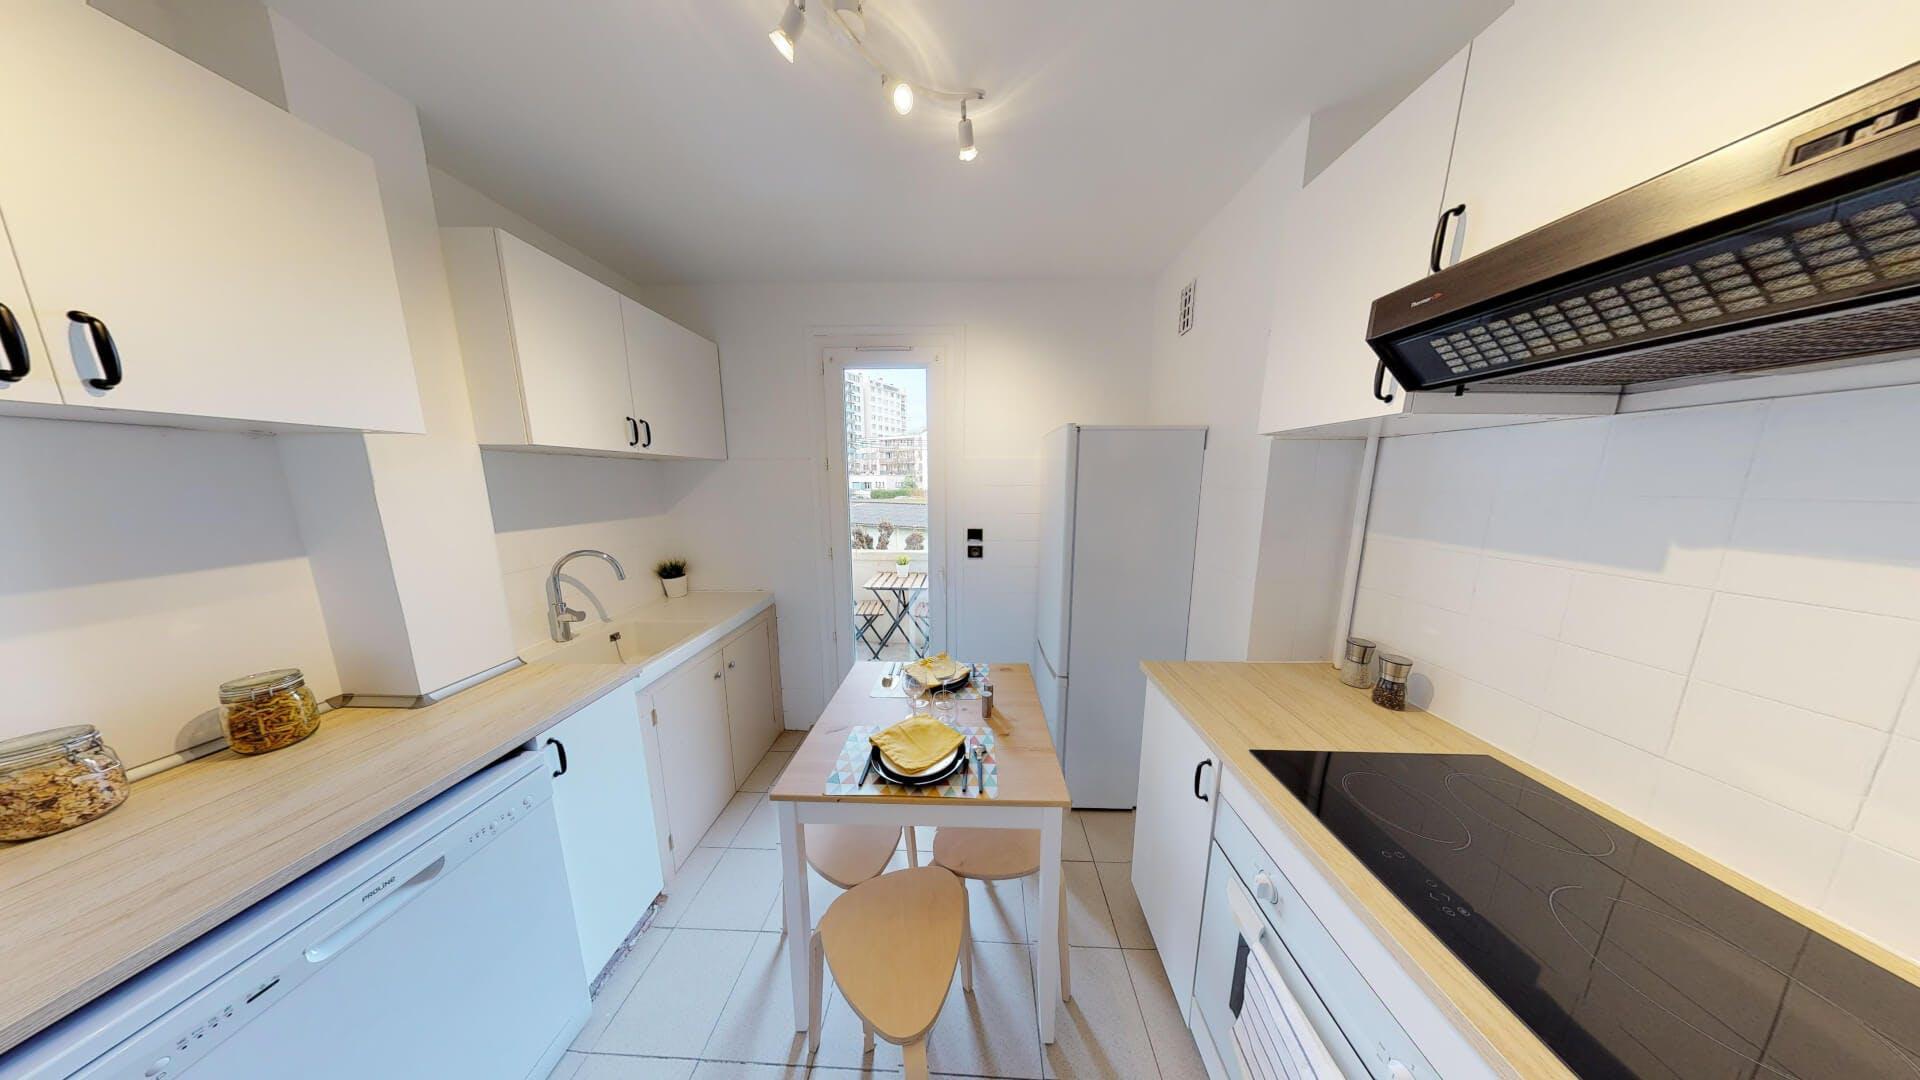 4 Residents   Compans   Modern Styled Apt. w/ Terrace + Workspace